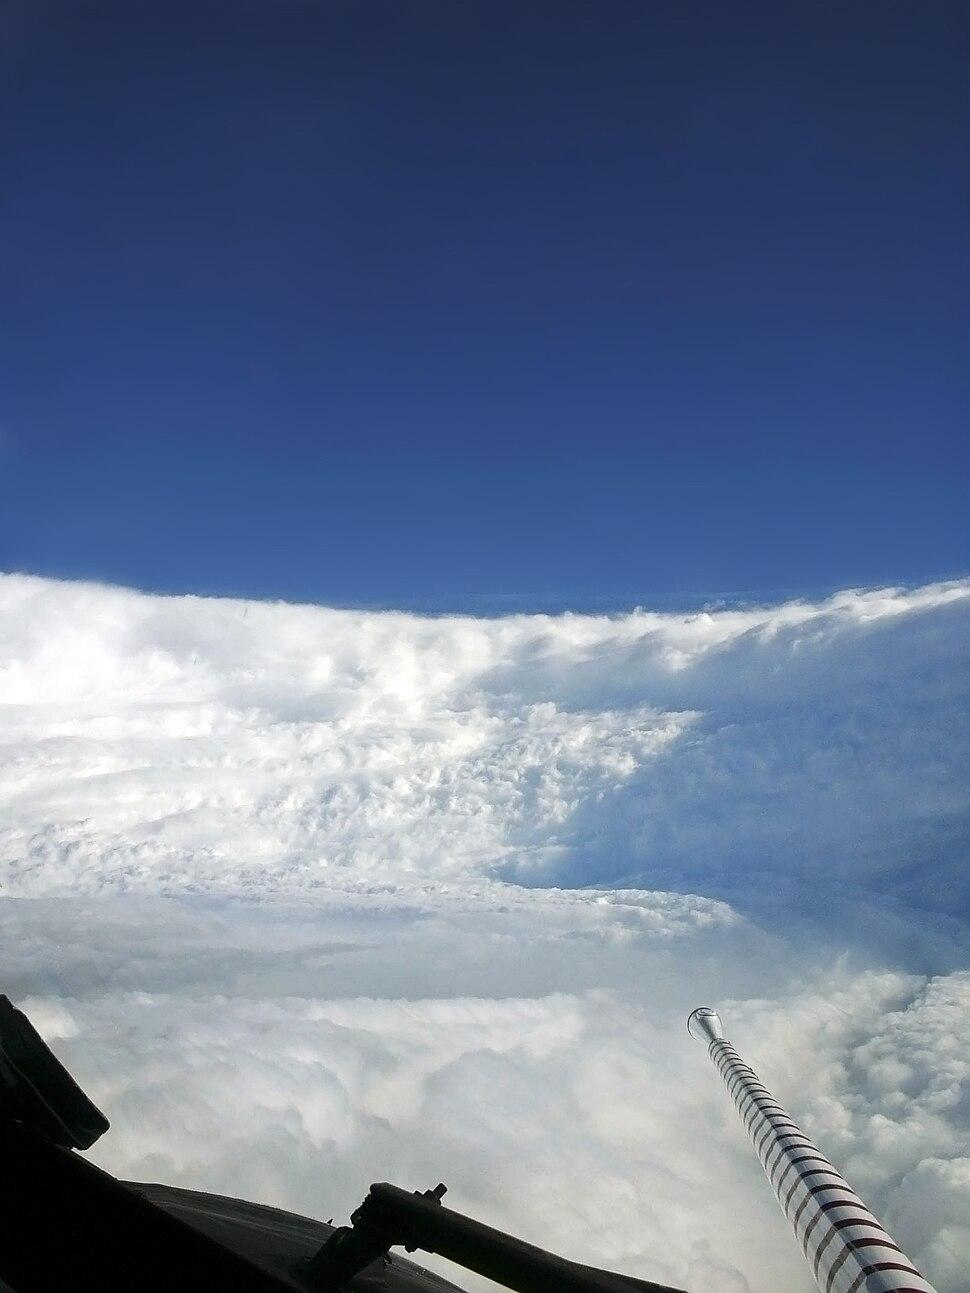 Hurricane Katrina Eye viewed from Hurricane Hunter